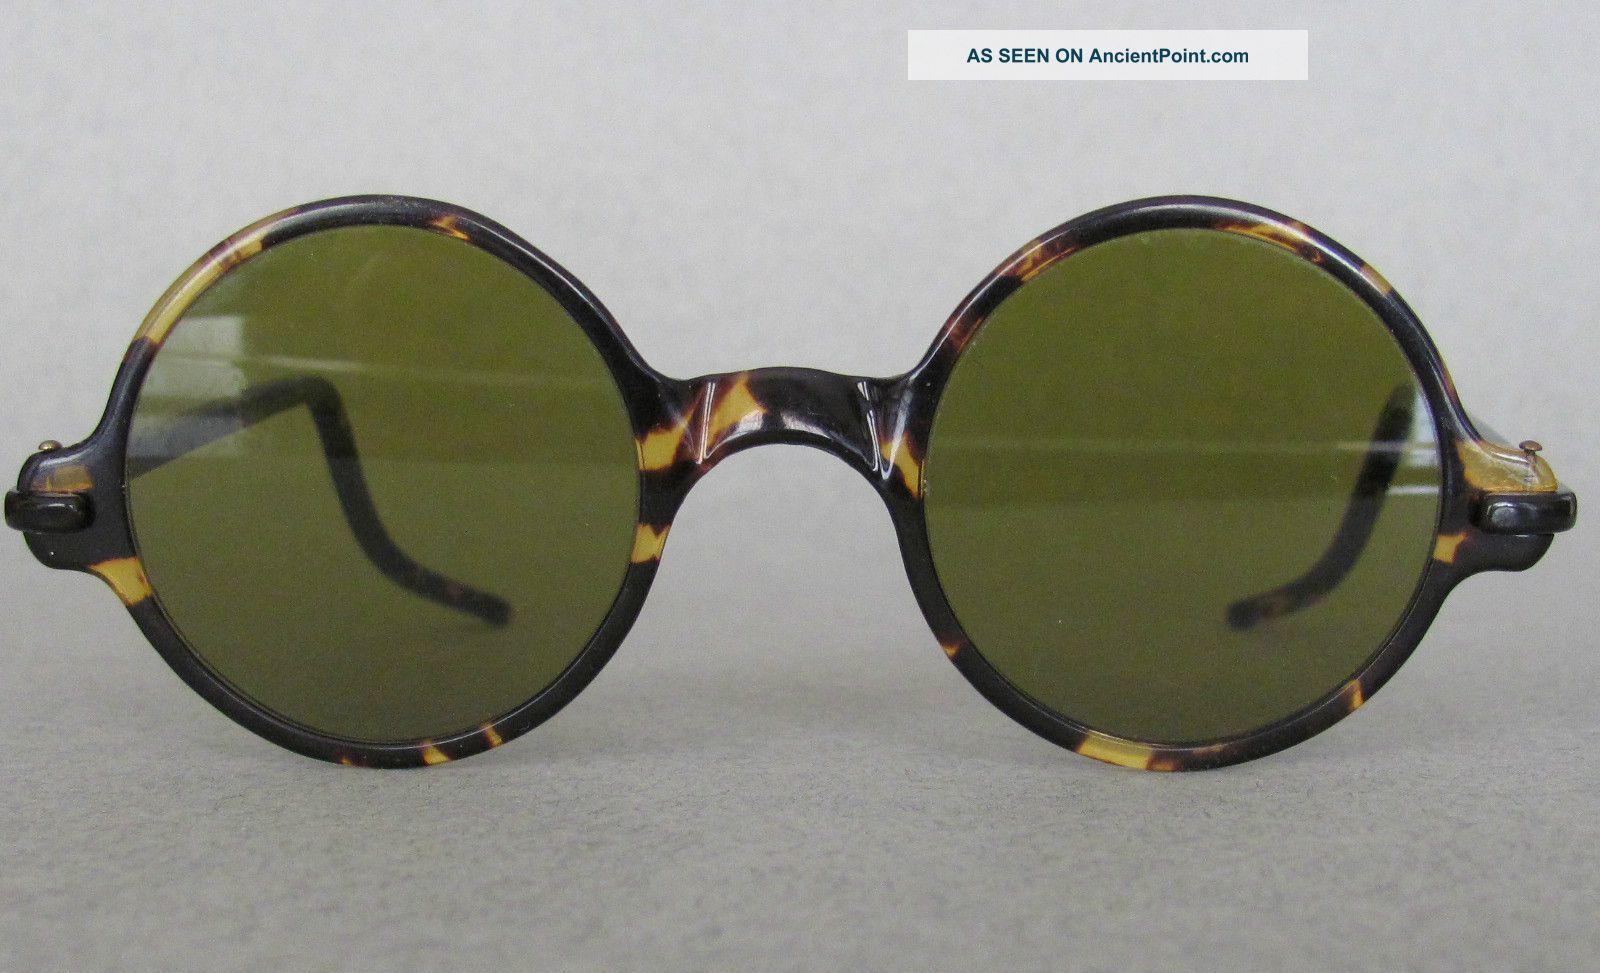 b679f27ece35 Antique Ca1890 Faux Tortoise Shell Sunglasses Round Frames Steampunk  Bakelite